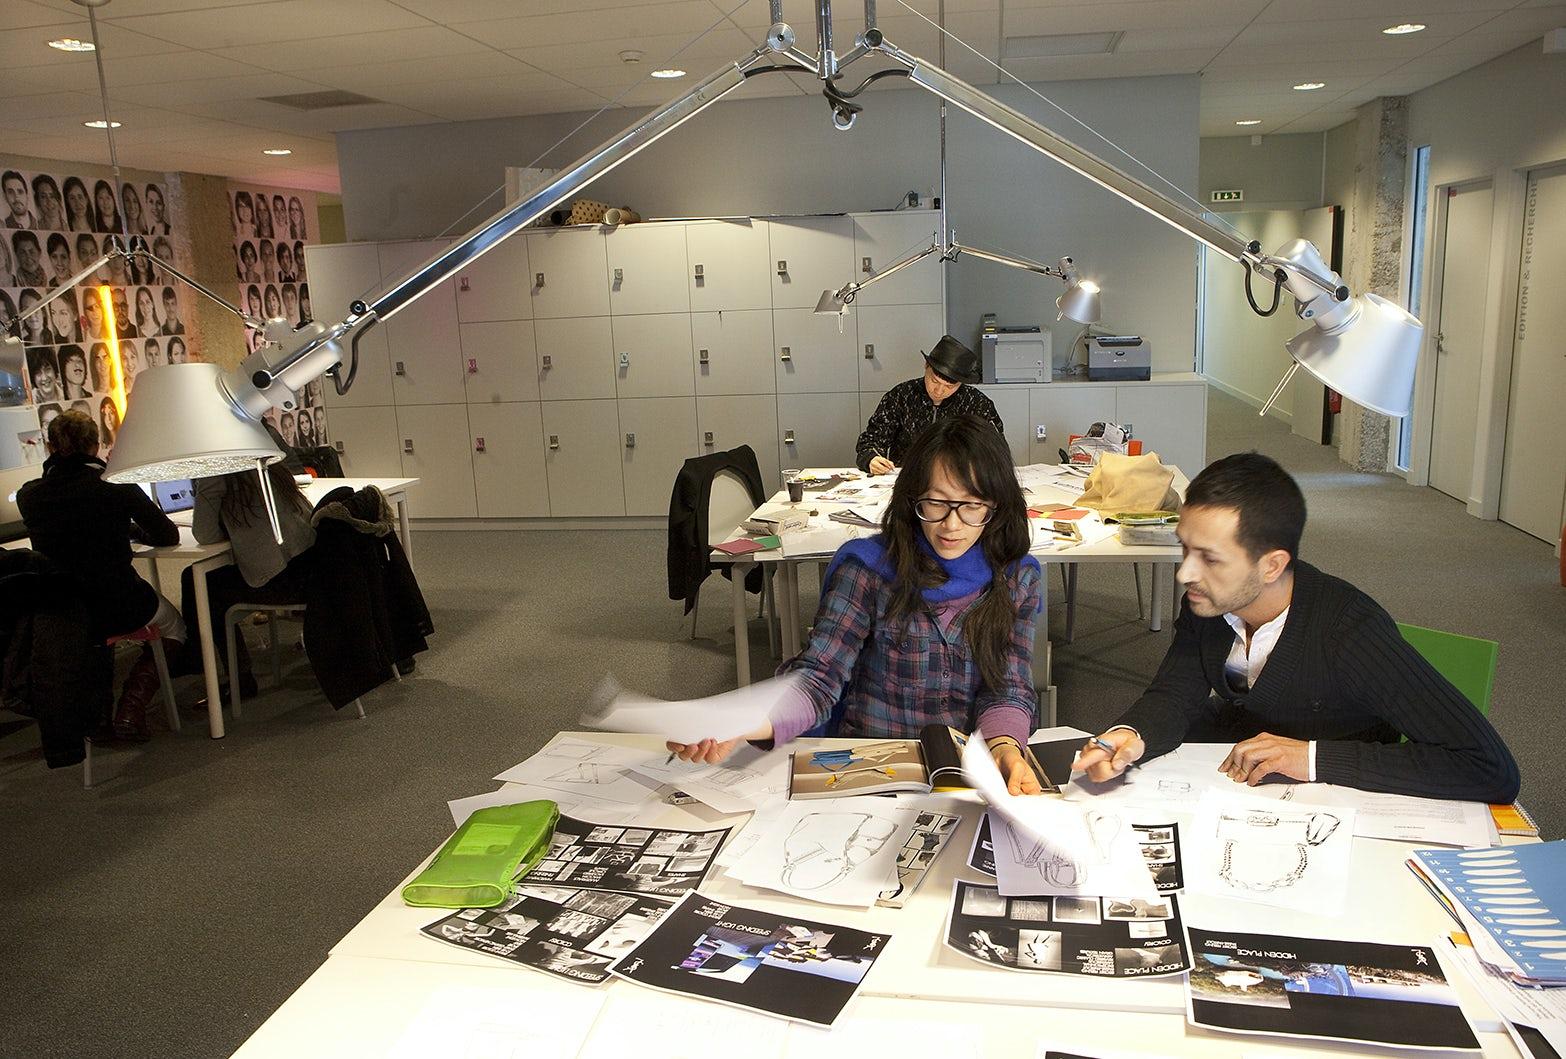 Institut Français de la Mode | Source: Gaillarde Deslandes for IFM